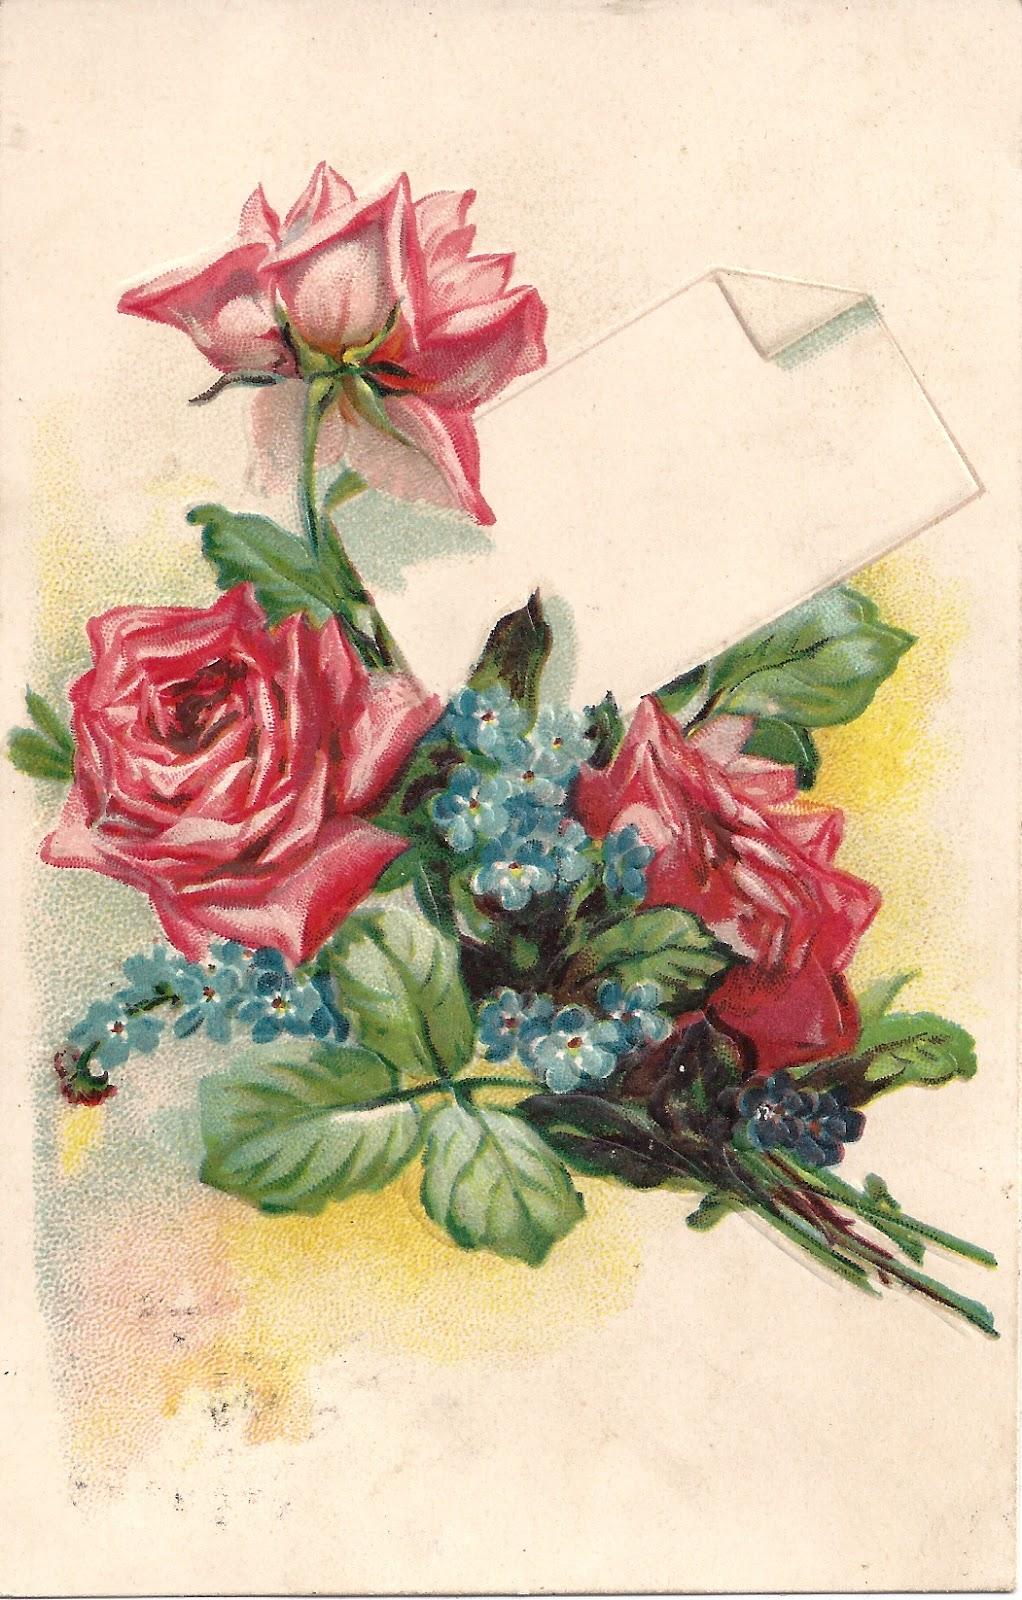 http://3.bp.blogspot.com/-pMhLKQw27ek/T14mqtmSUjI/AAAAAAAAAs4/X5SaTOFNdAY/s1600/Lovely+Rose+Spray+&+Forget+Me+Nots+A+JunkinGypsies.jpg